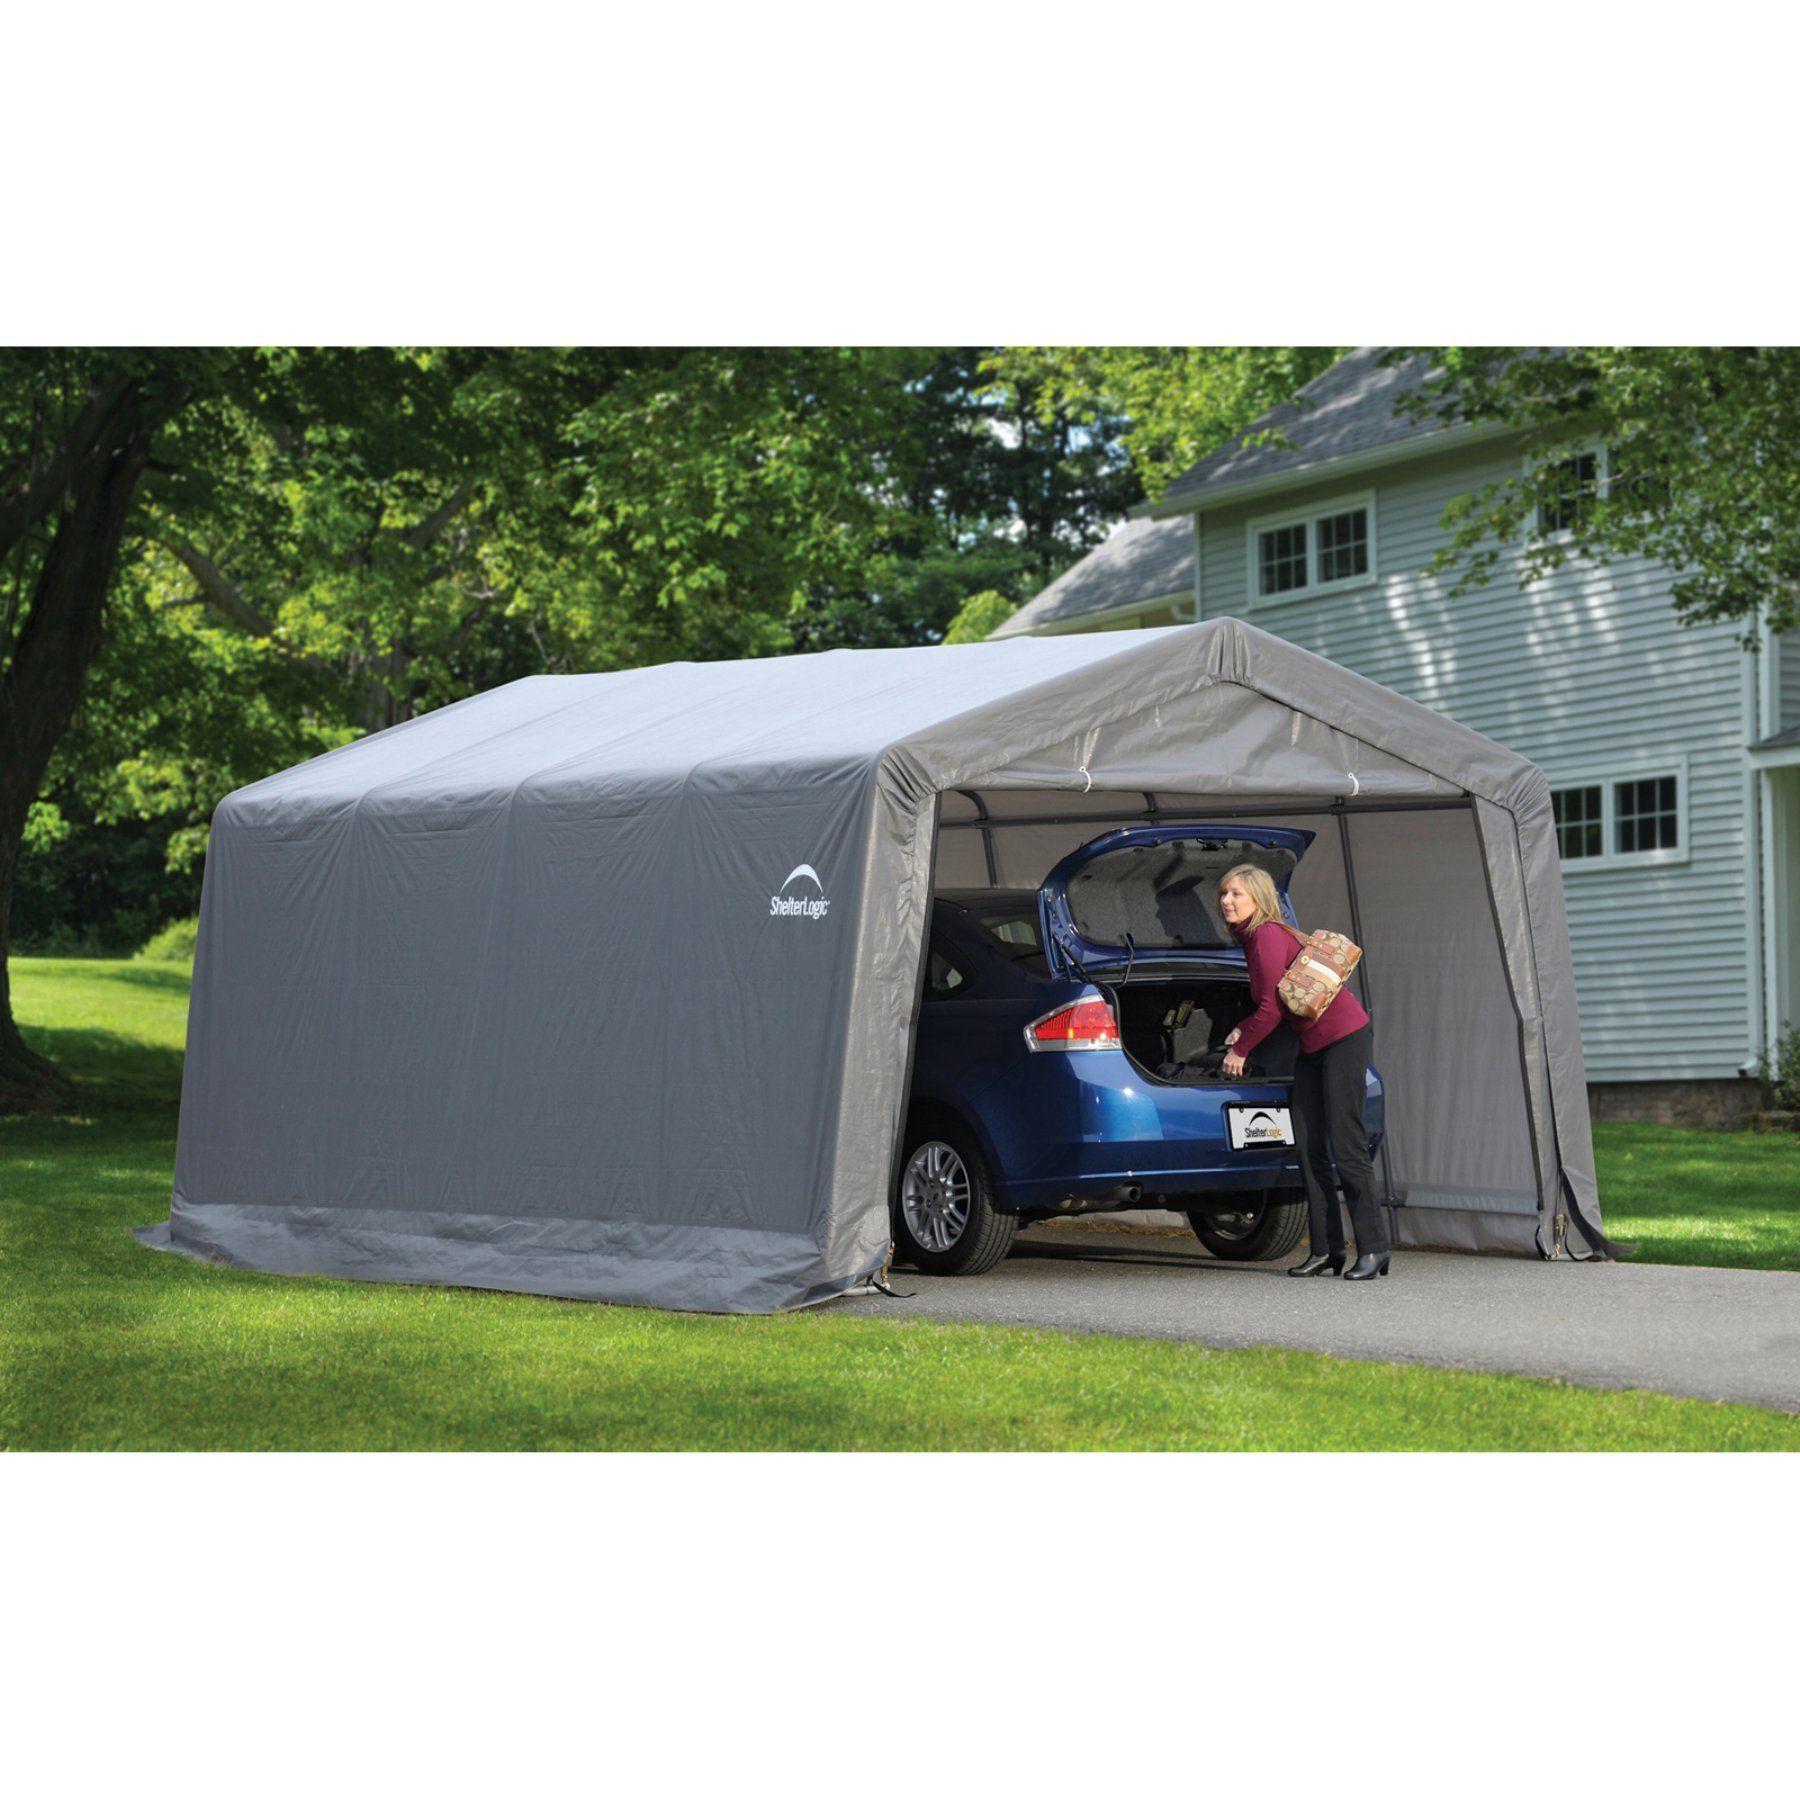 ShelterLogic 12 x 16 Garage in a Box â